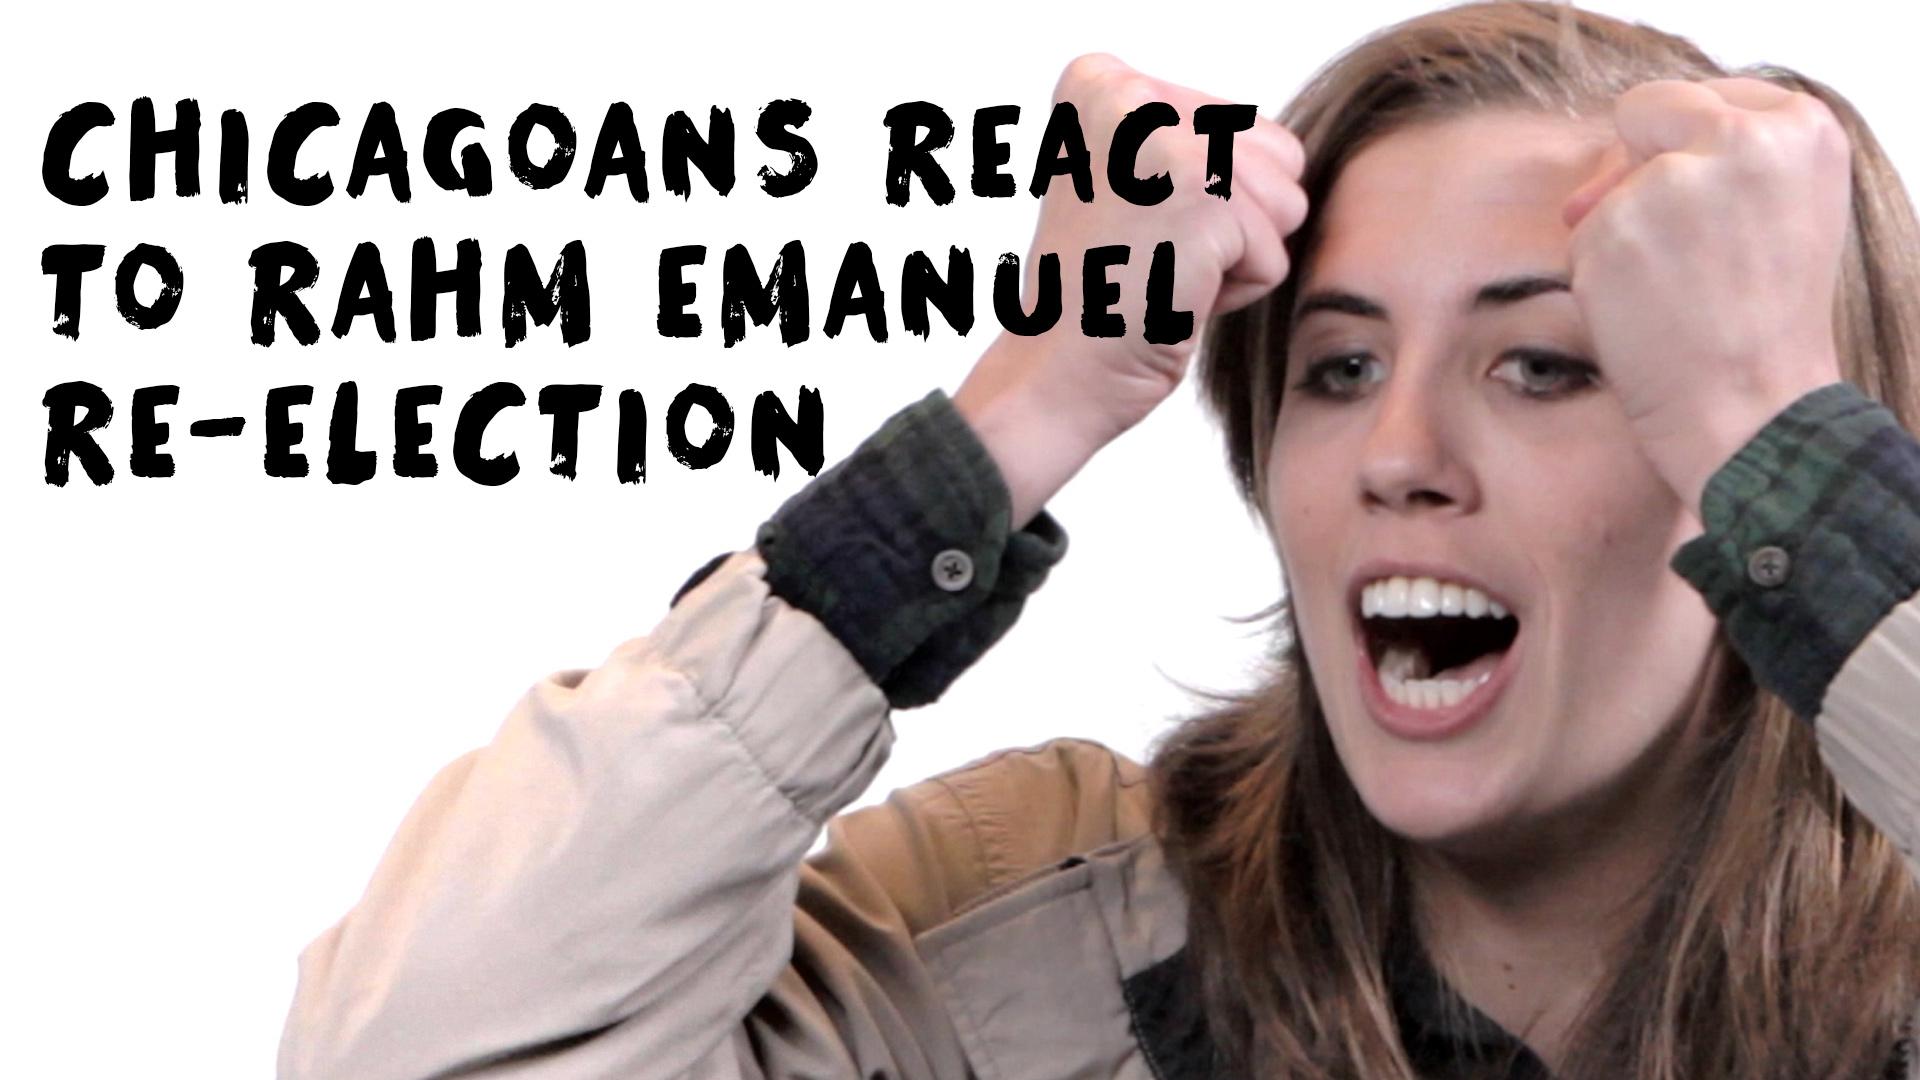 Chicagoans React to Rahm Emanuel Re-Election